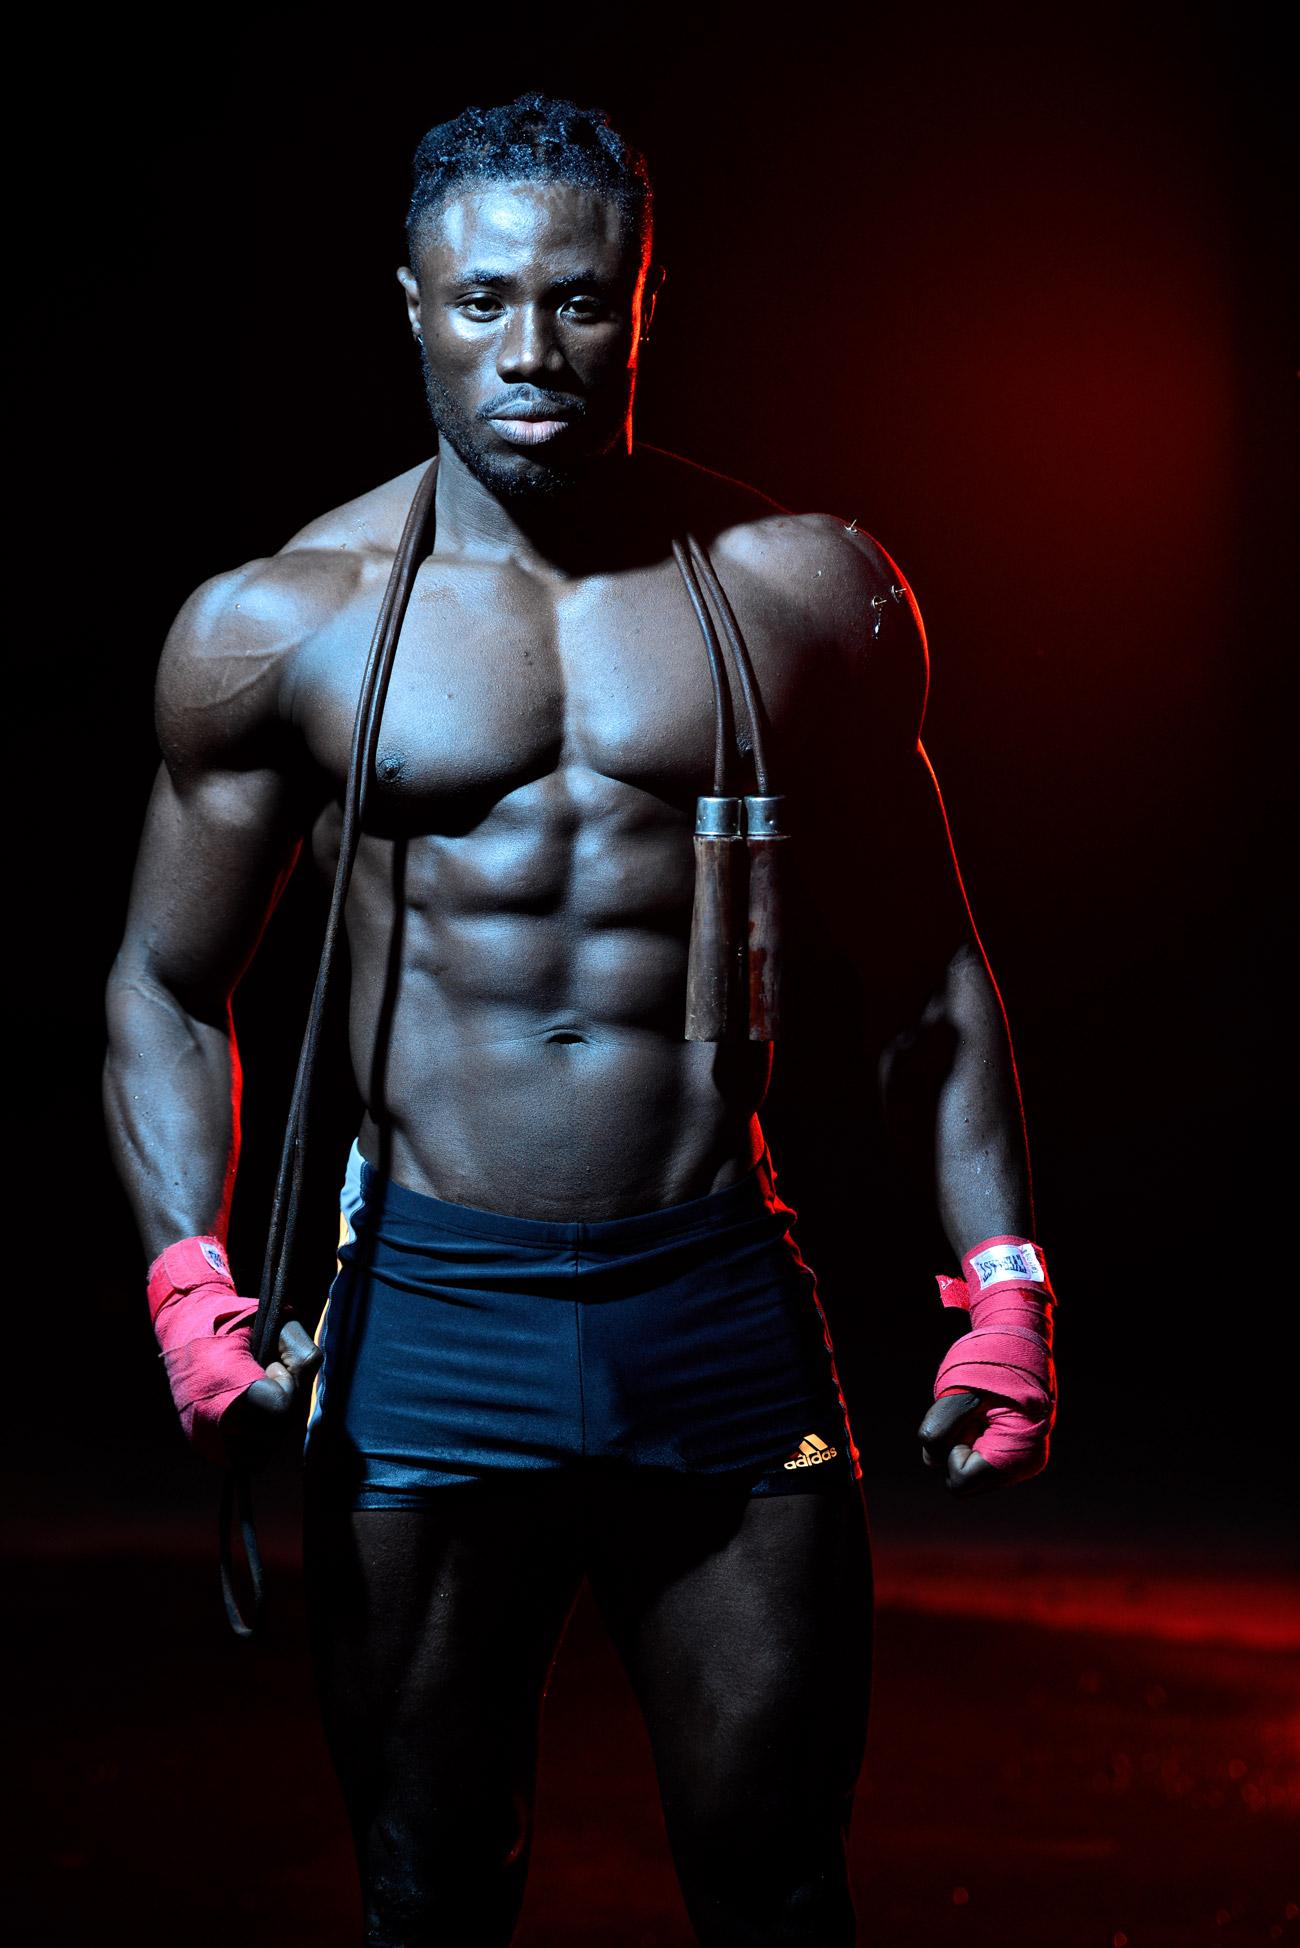 sports-fitness-boxer-portrait-photography-brandon-barnard-photographer.jpg